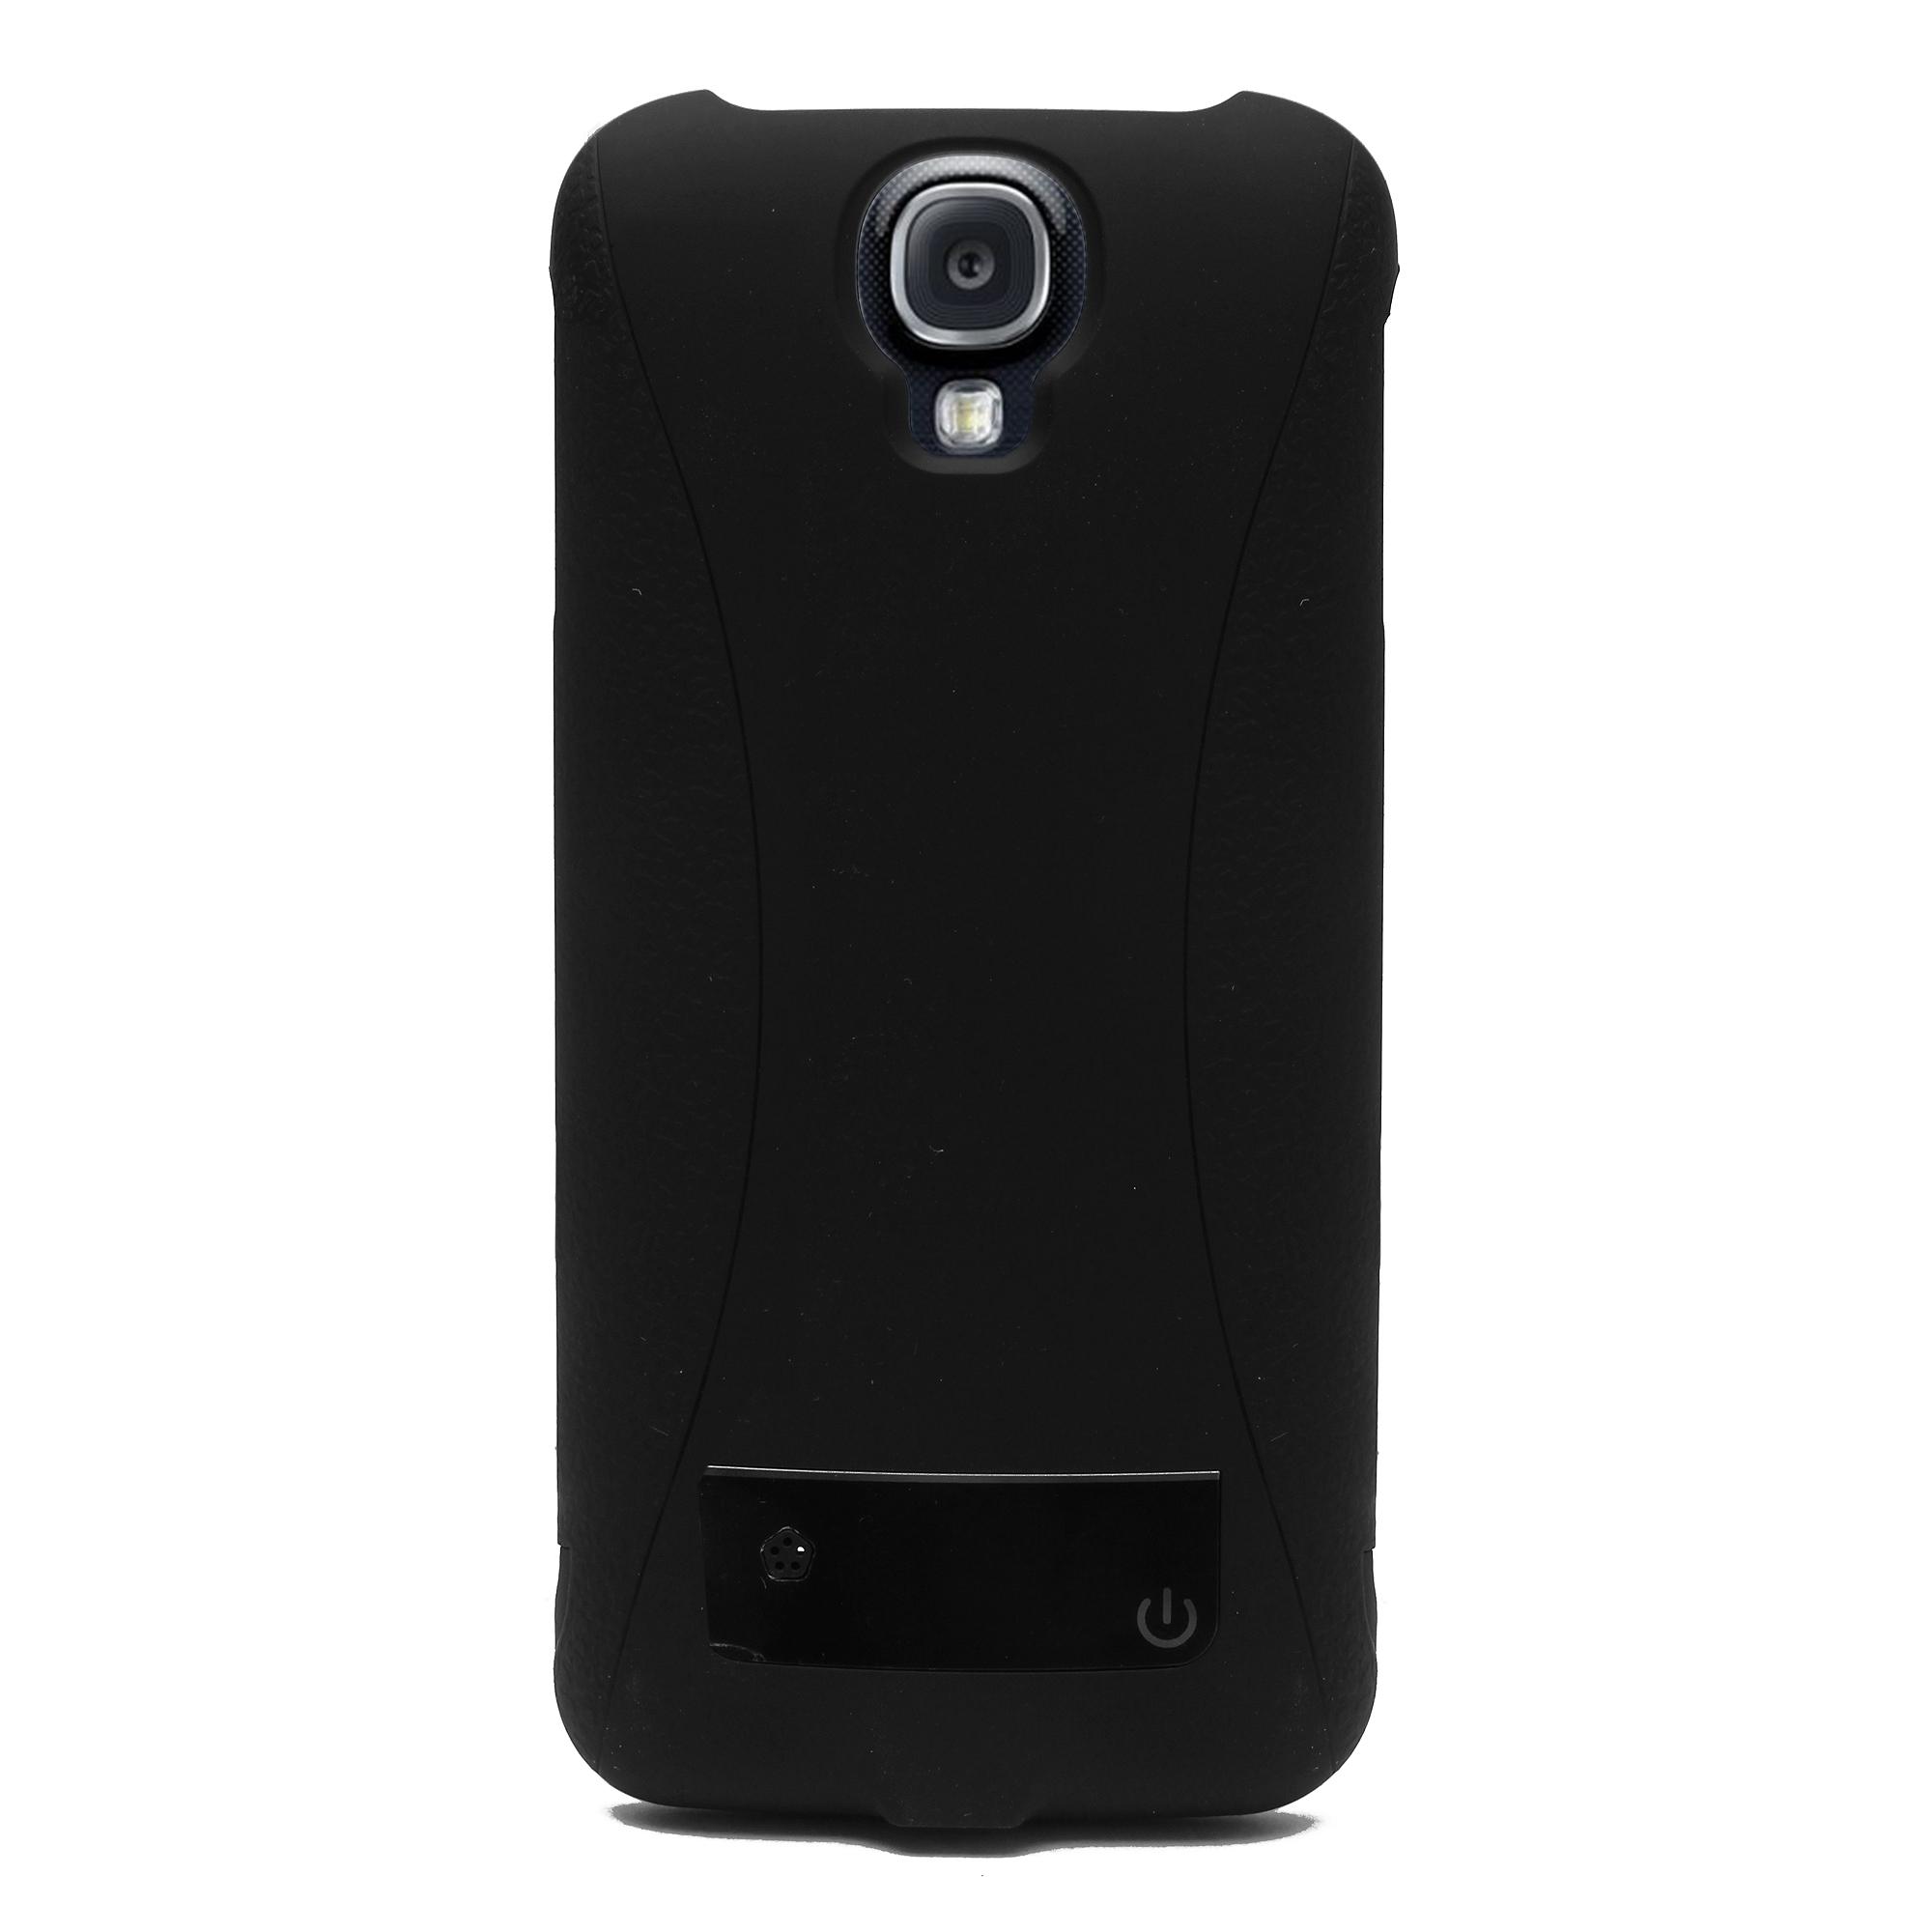 Samsung galaxy s4 black friday deals 2018